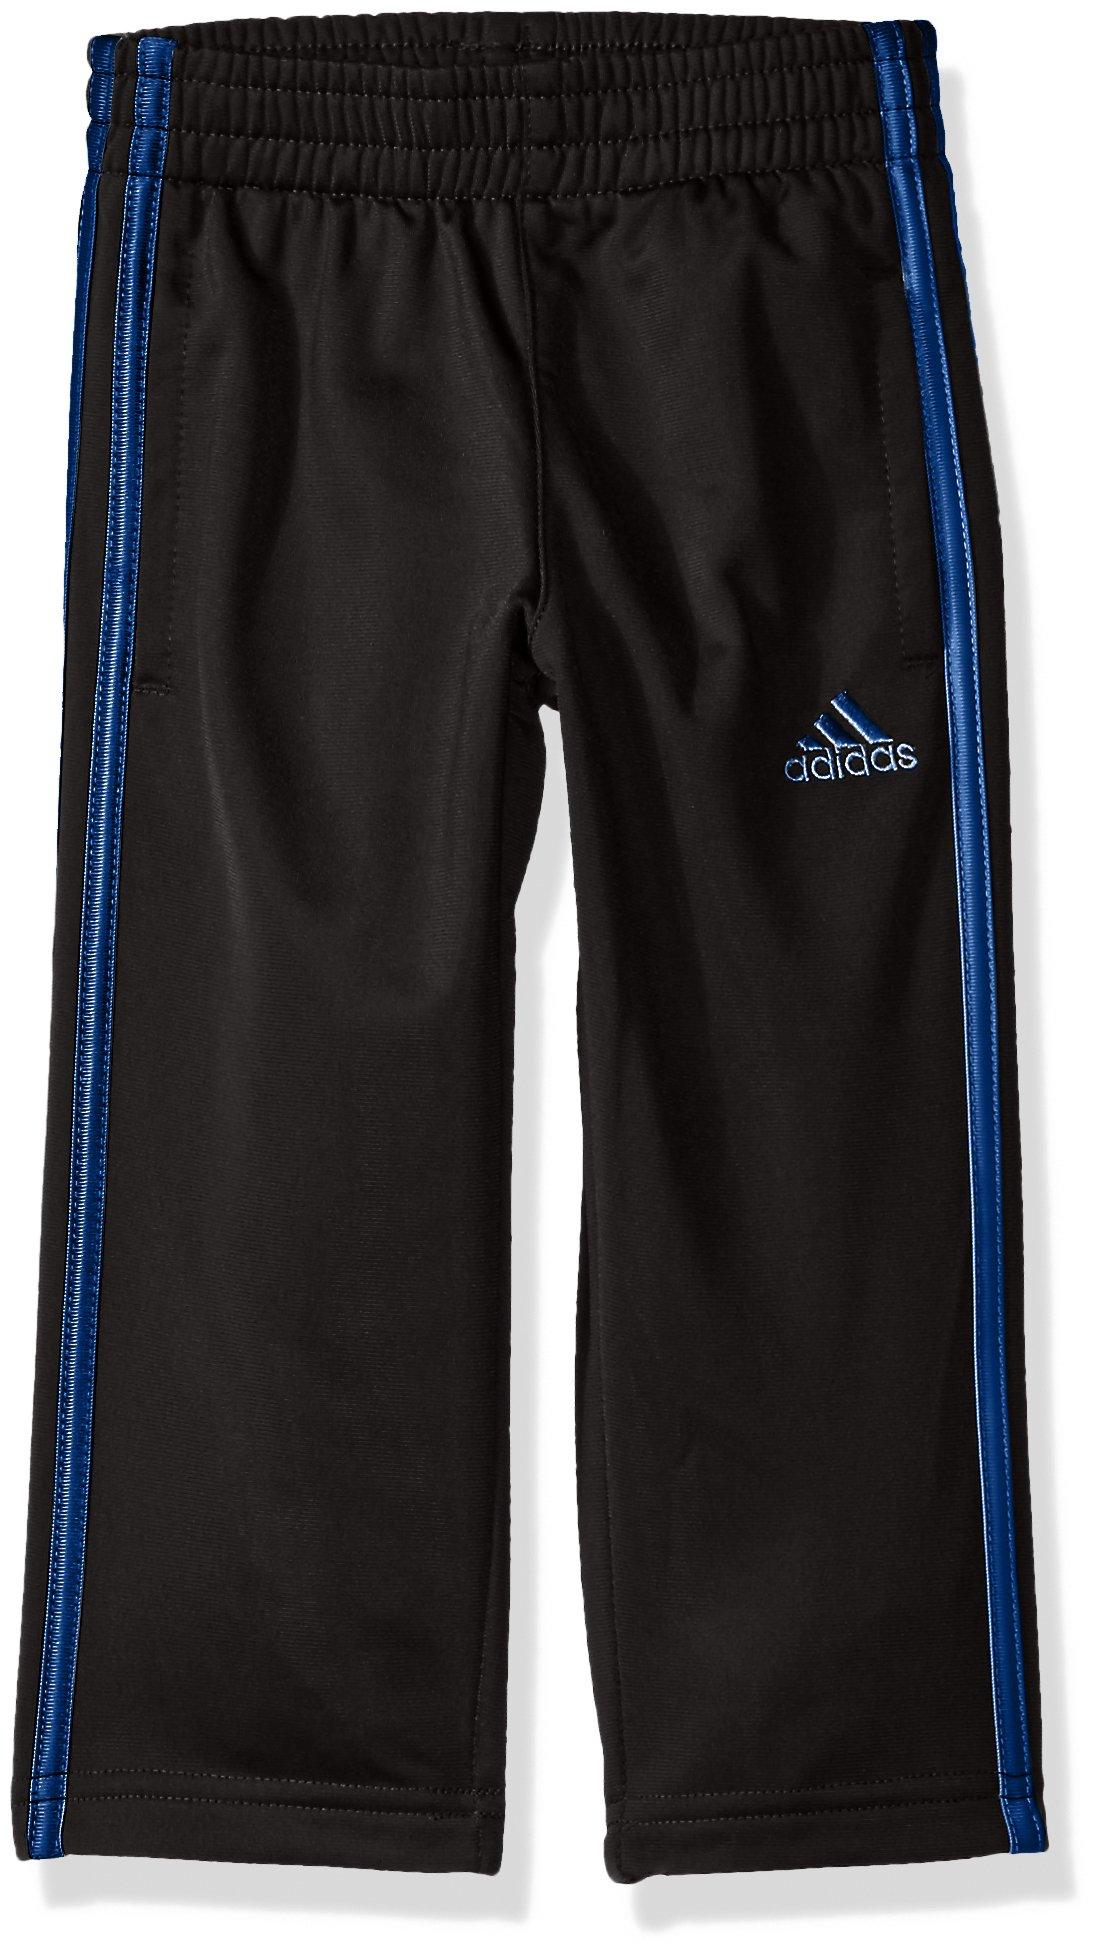 adidas Toddler Boys' Tricot Pant, Black/Blue, 4